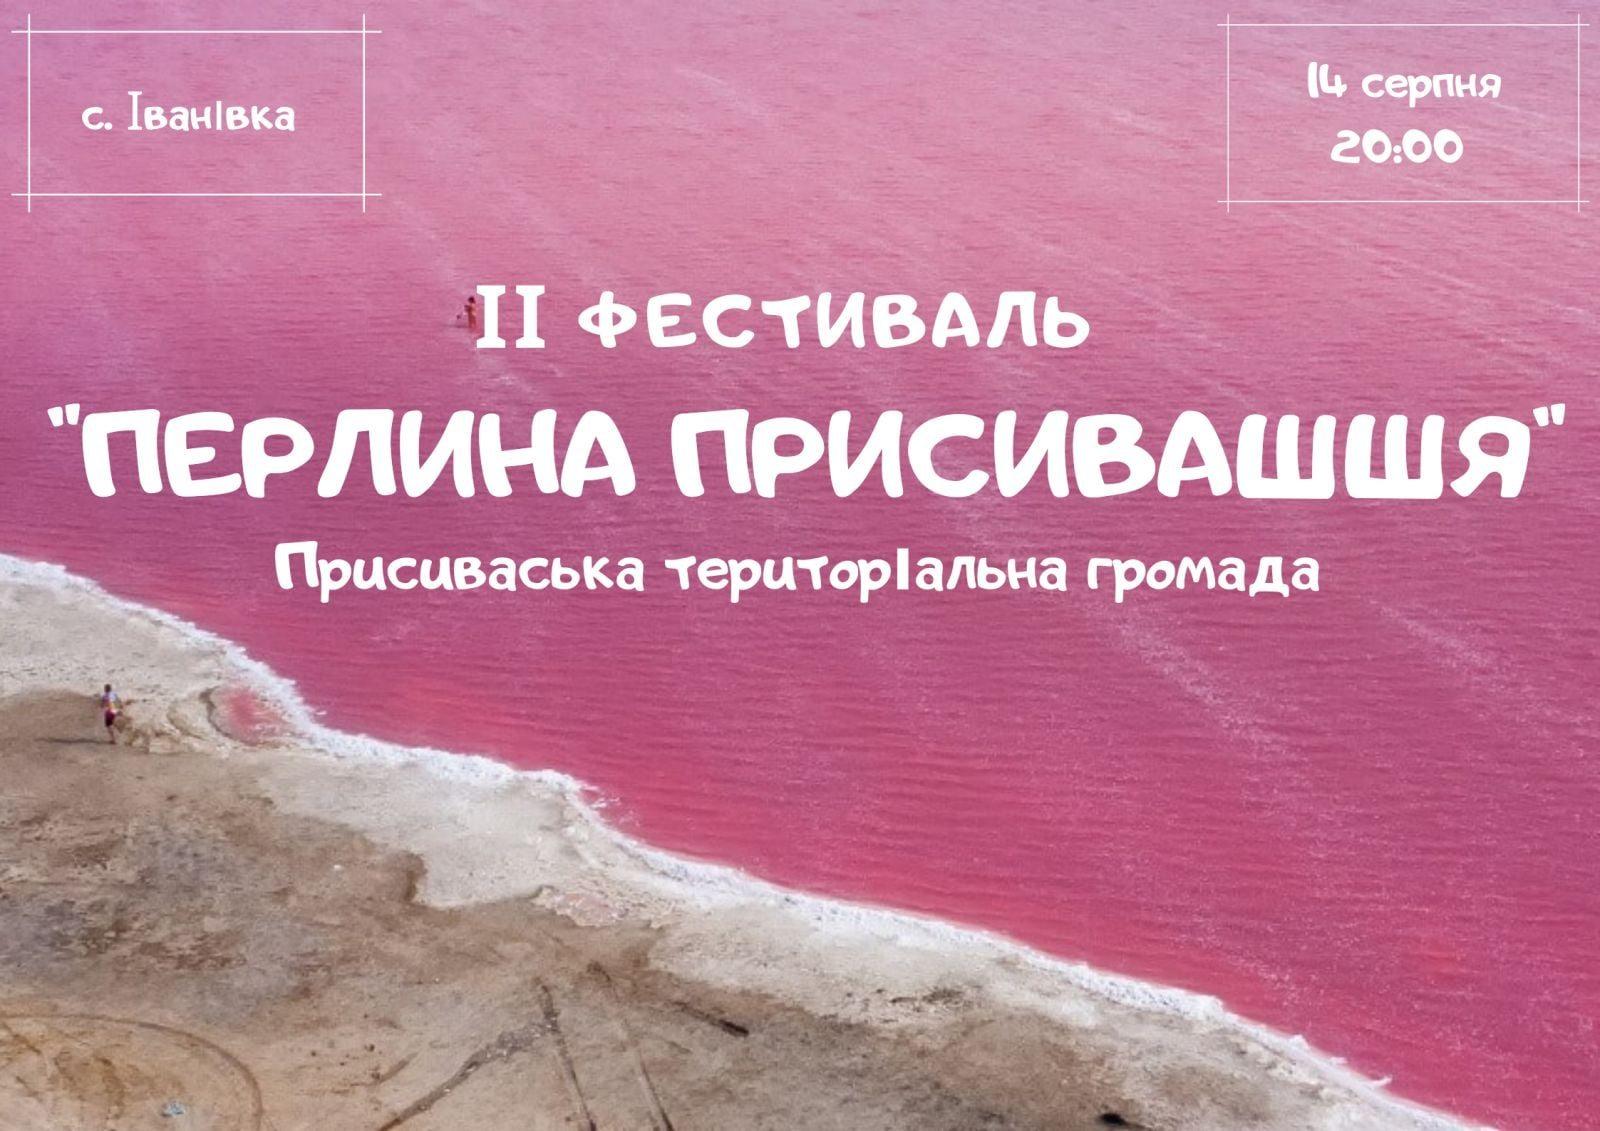 громада, фестиваль, Перлина Присивашшя